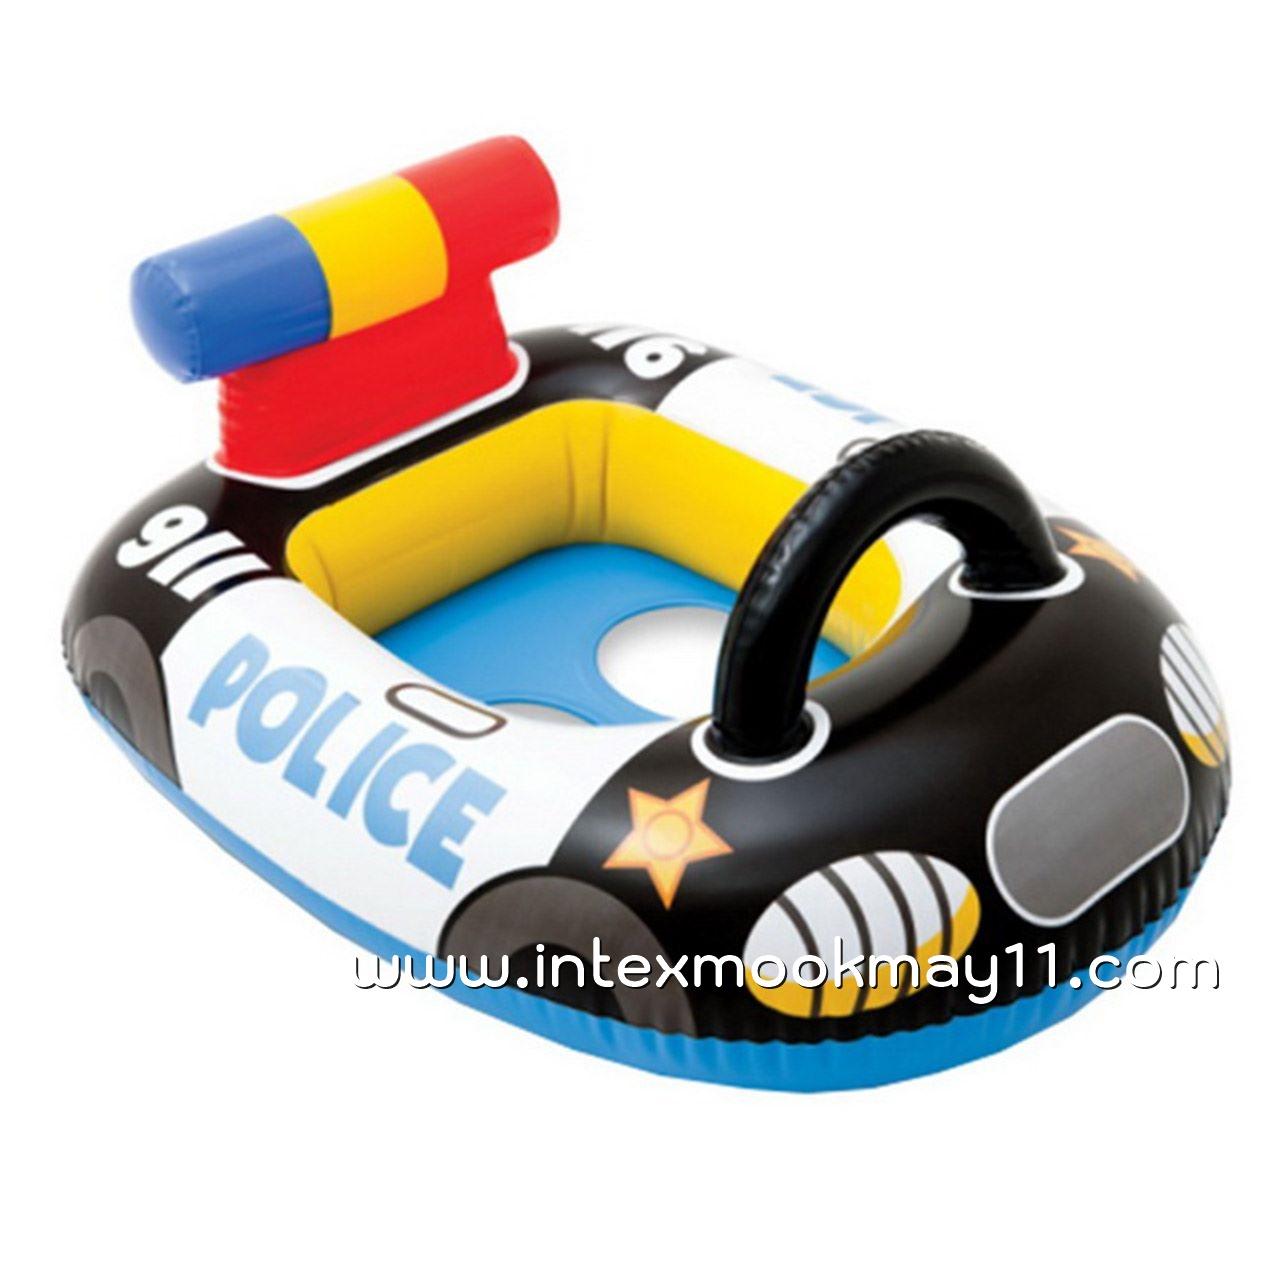 Intex Kiddie Car Float ห่วงยางสอดขาลายรถตำรวจ 59586